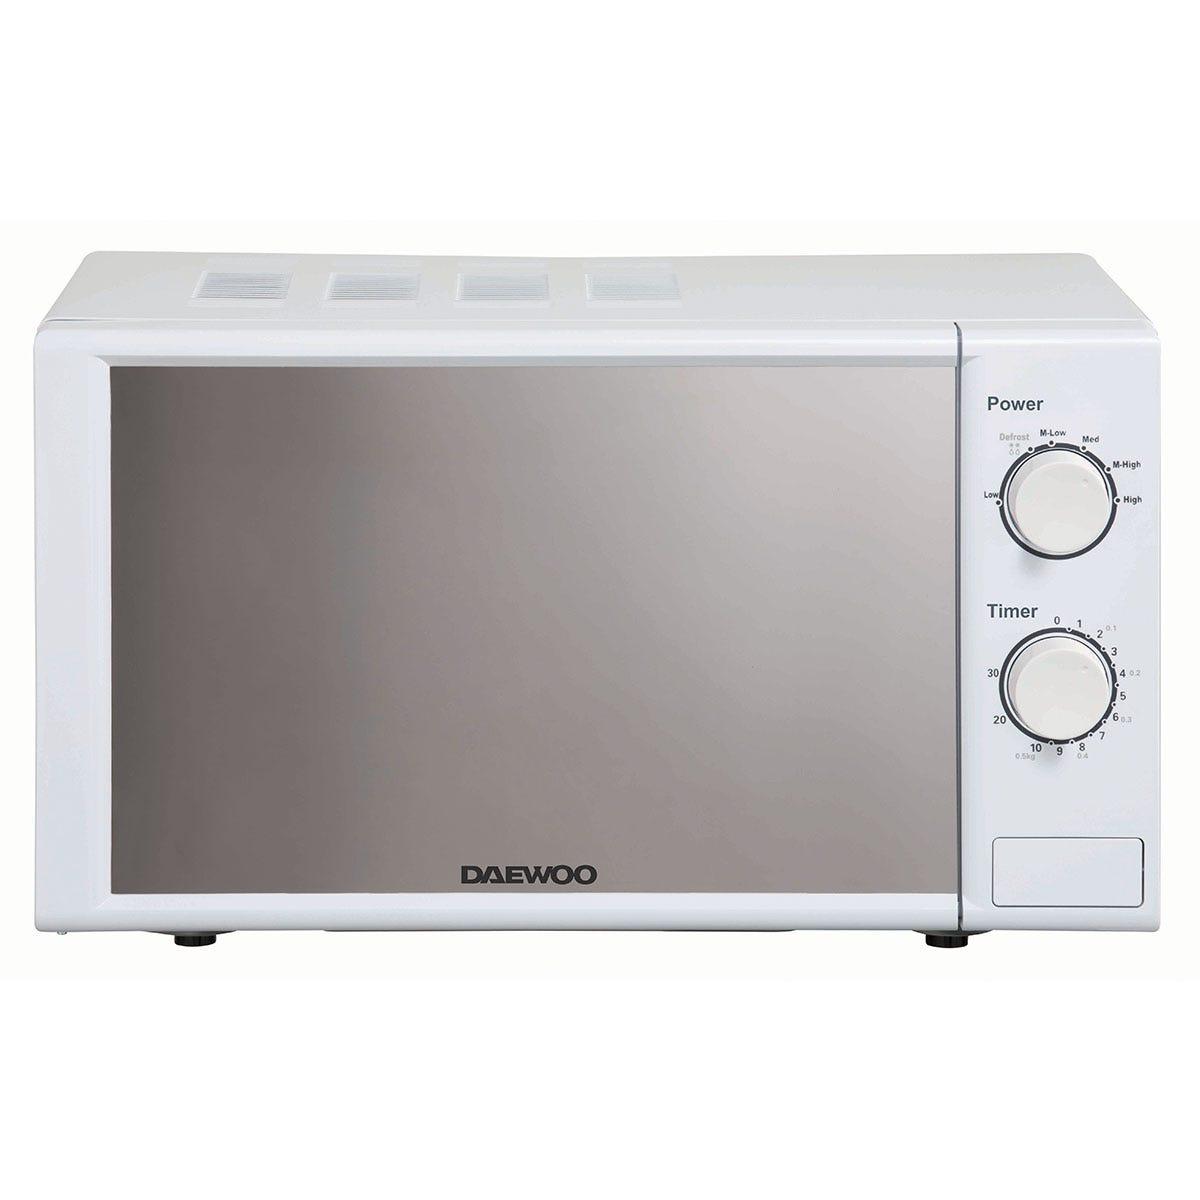 Daewoo SDA2084GE 20L 800W Manual Microwave - White